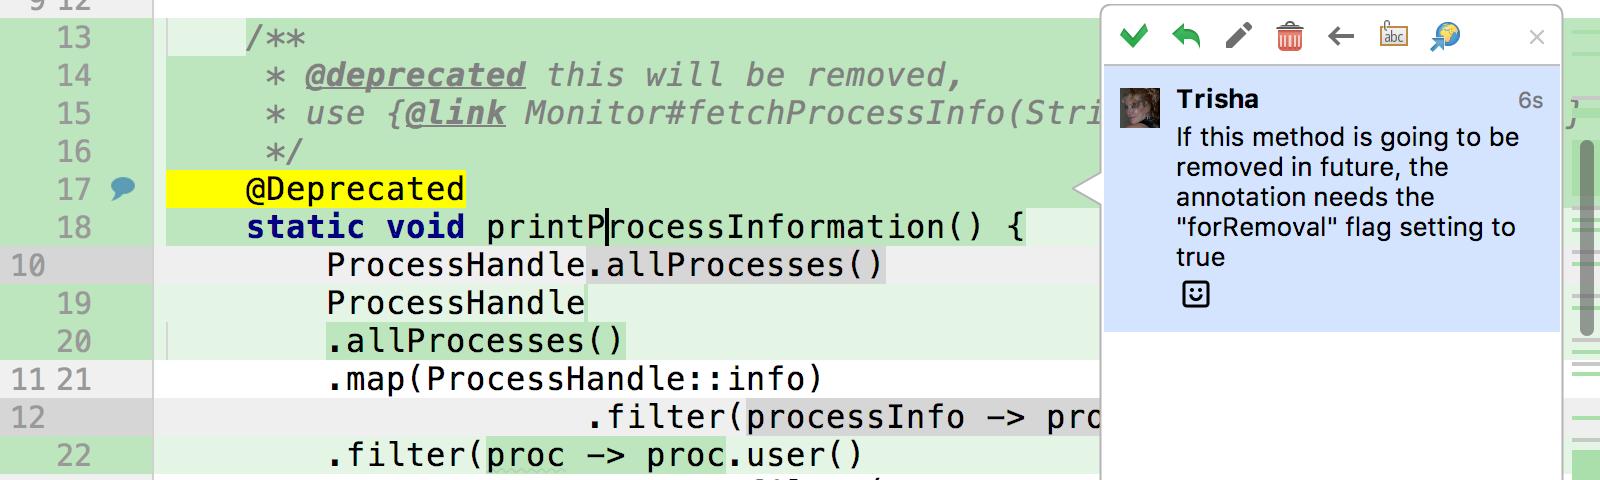 16-deprecated-method